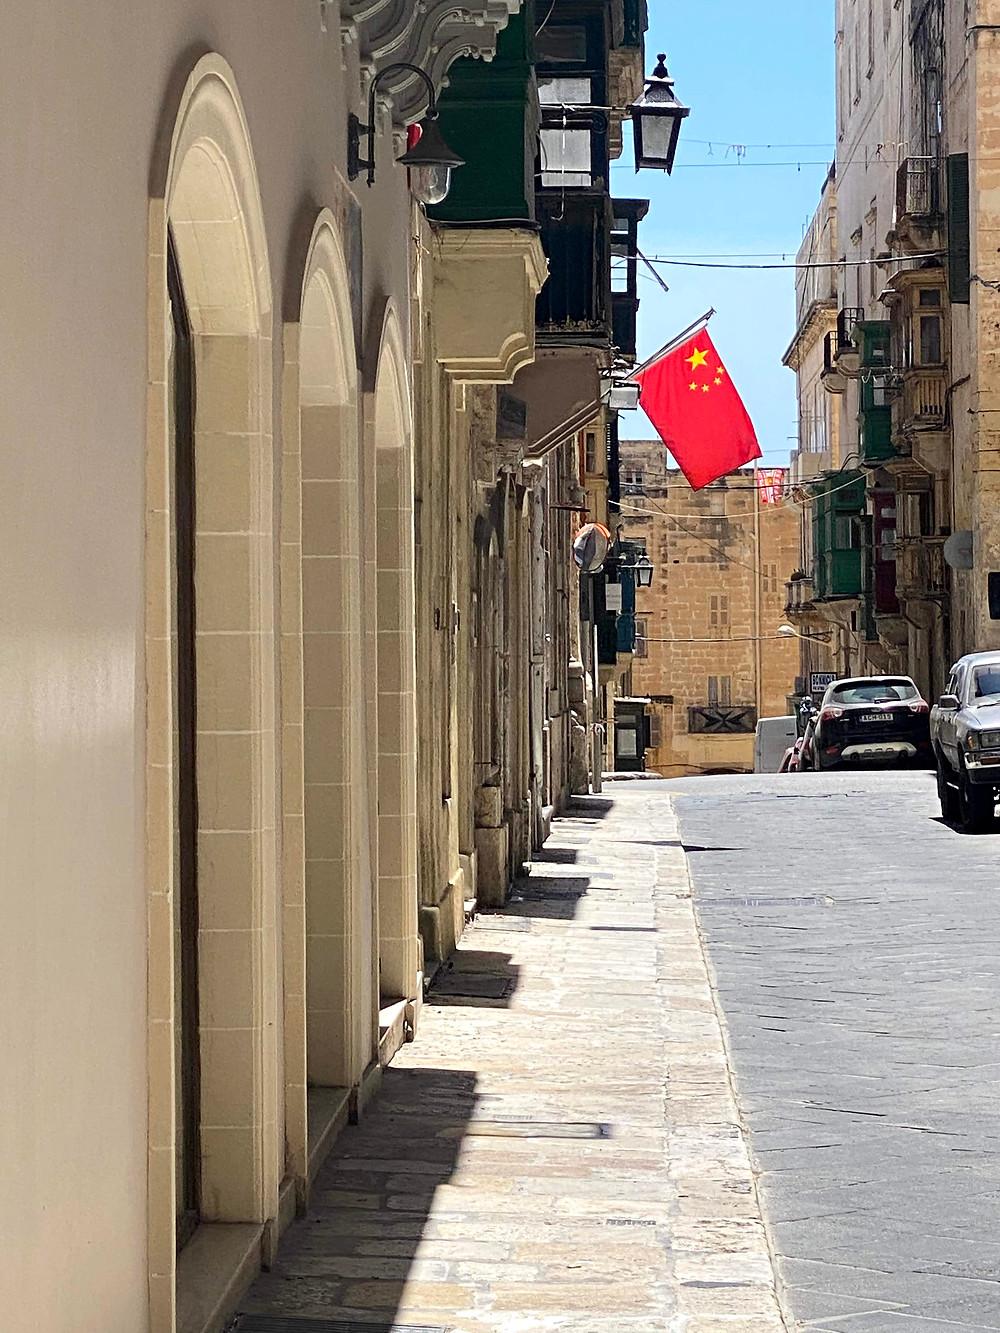 Chinese flag in Valletta, Malta